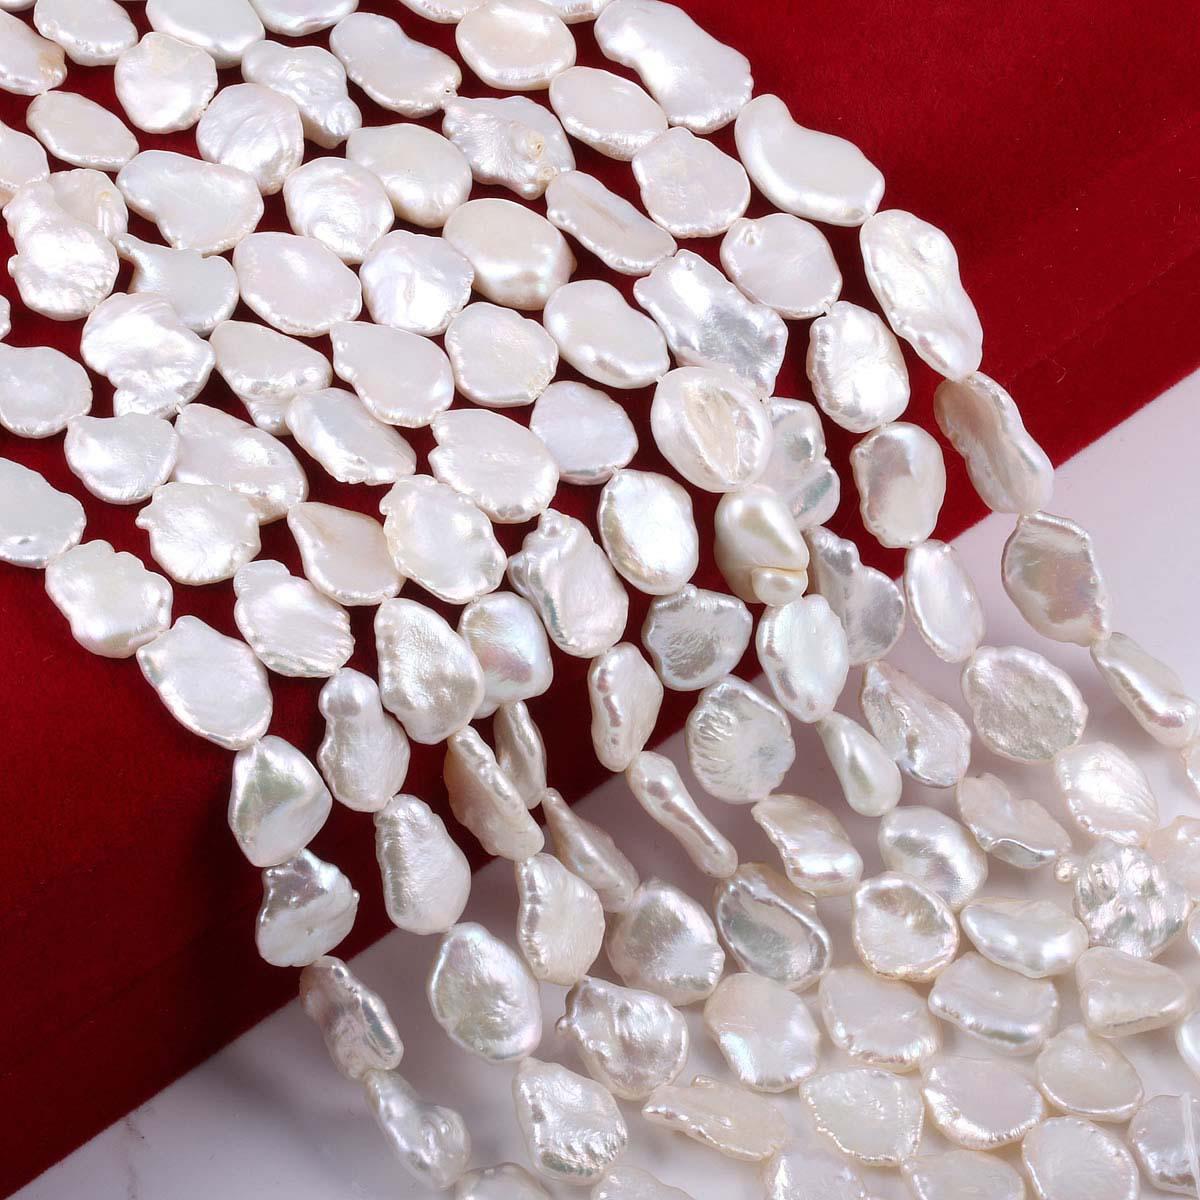 Perla Natural de agua dulce cordón moda aislamiento de para fabricación de joyería DIY, collar, pulsera, venta al por mayor de accesorios